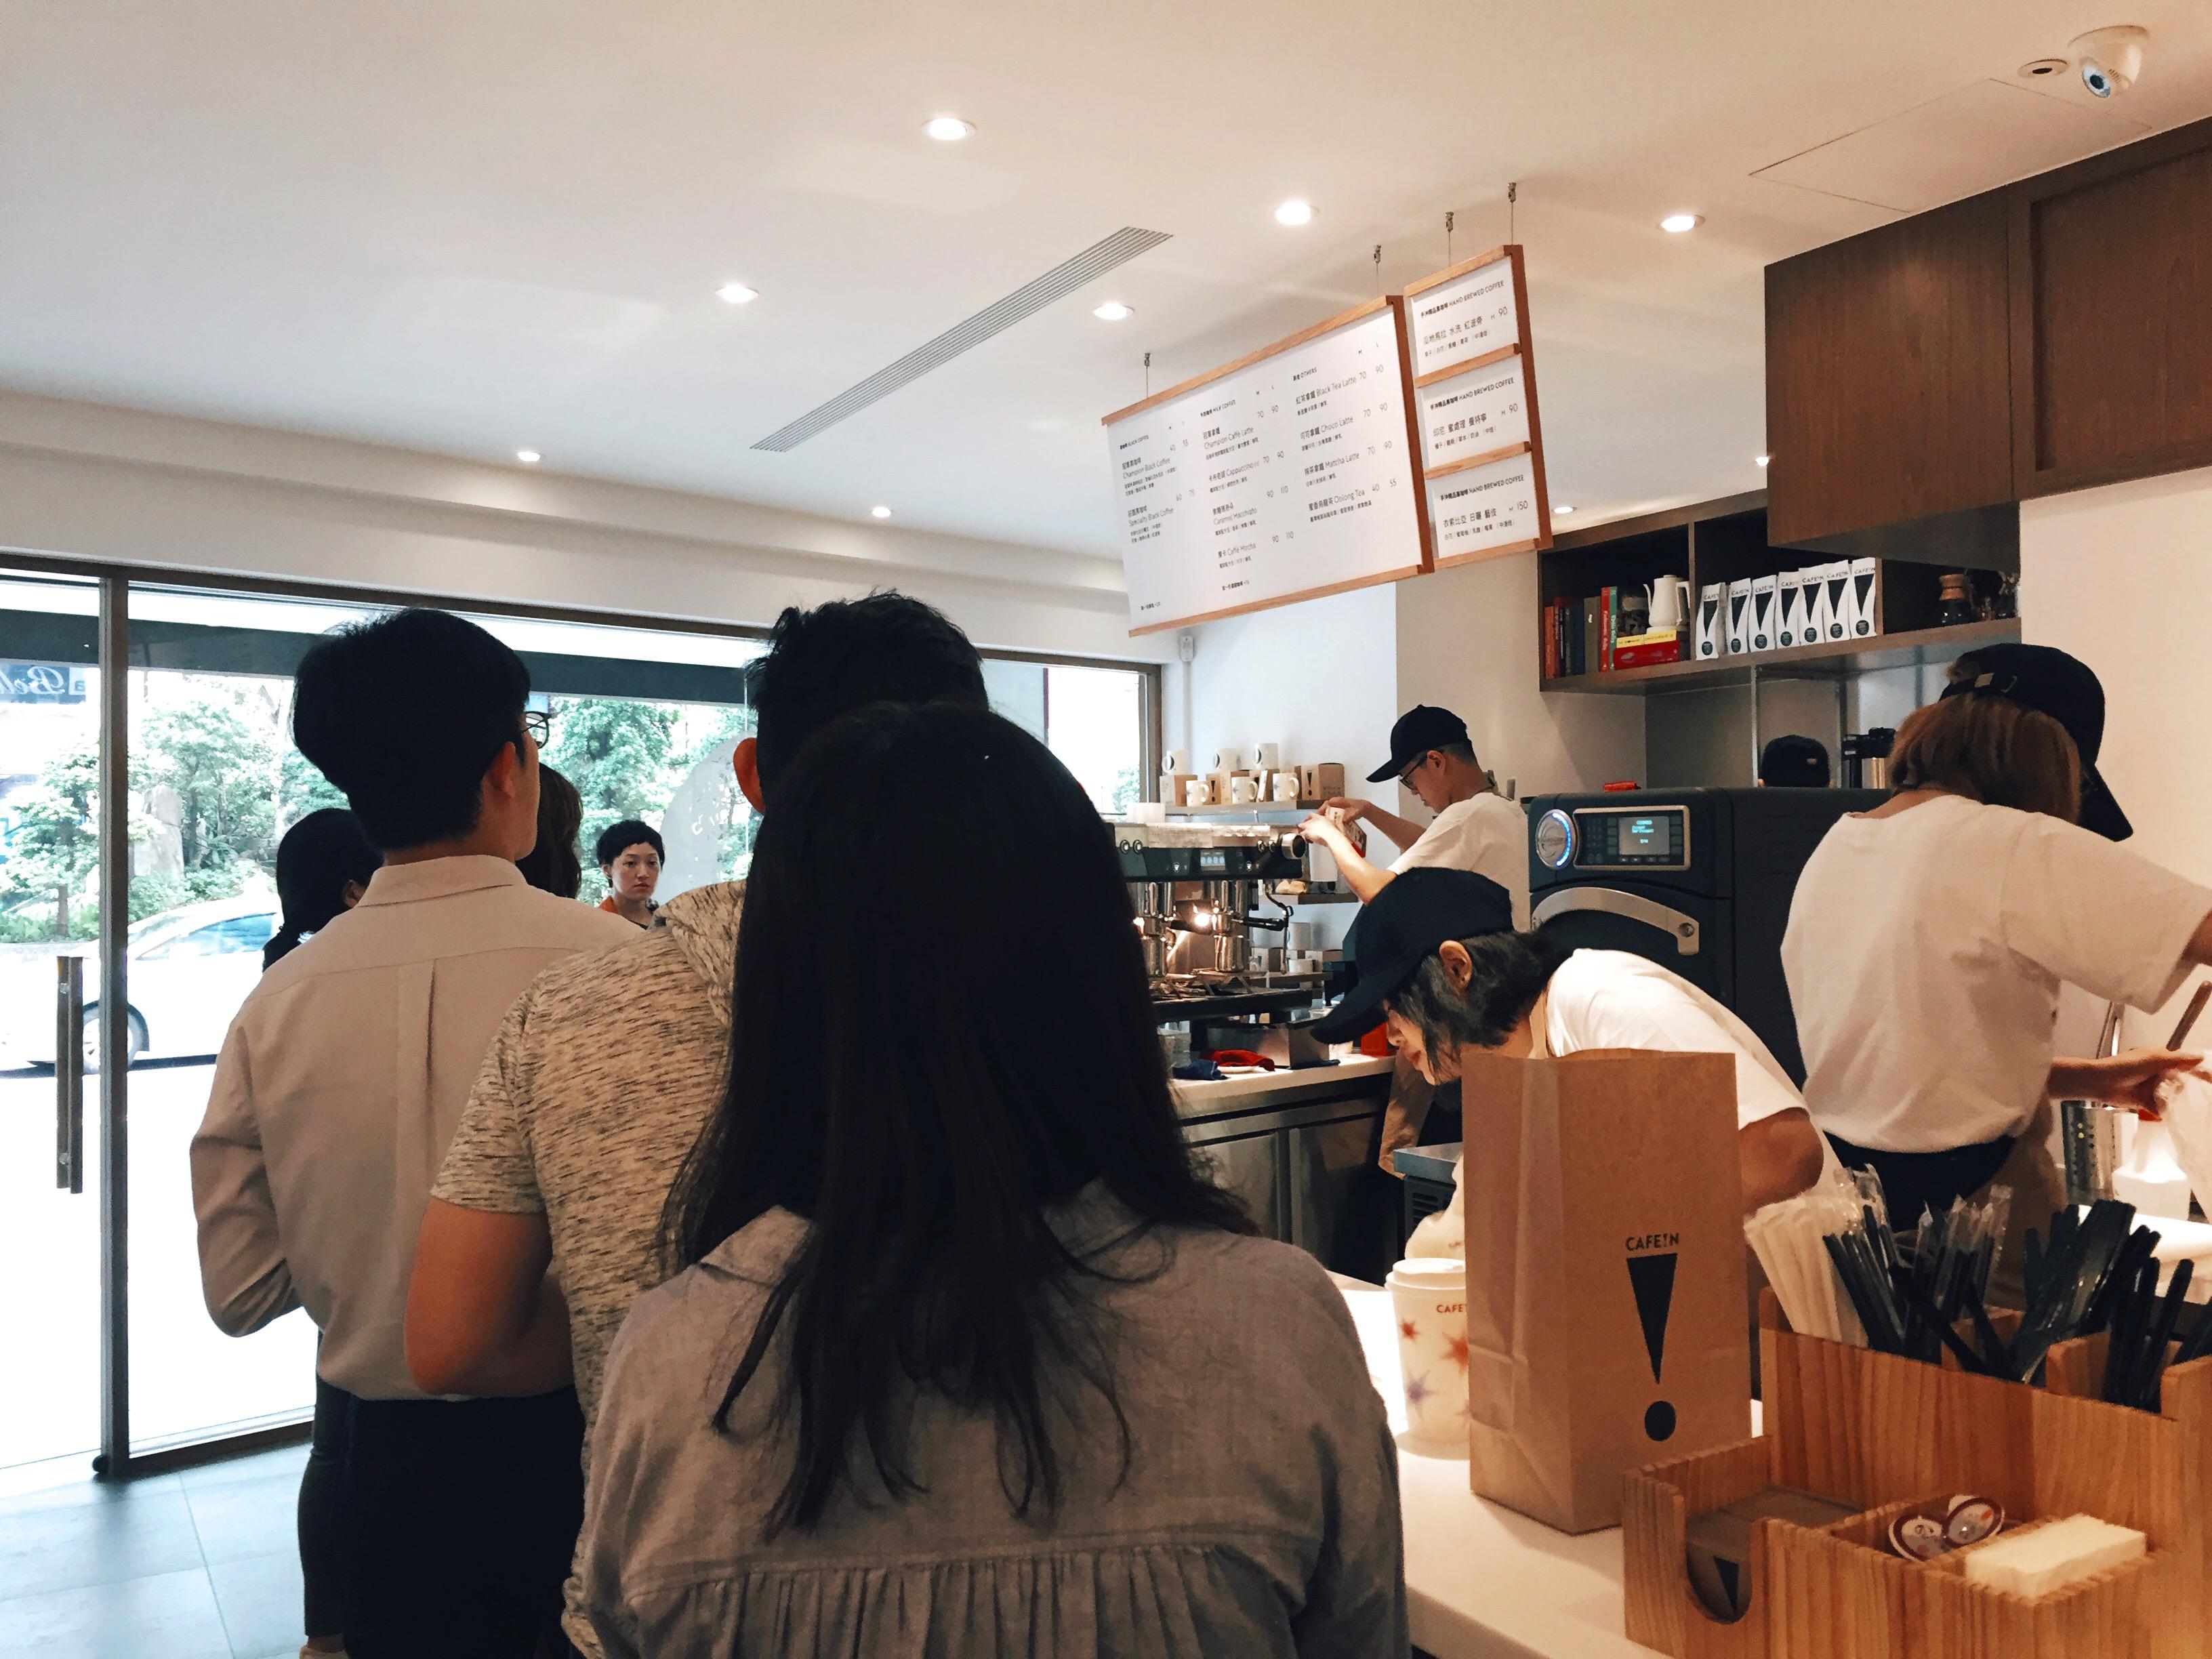 CAFE!N硬咖啡,台北東區咖啡店滿滿的人潮